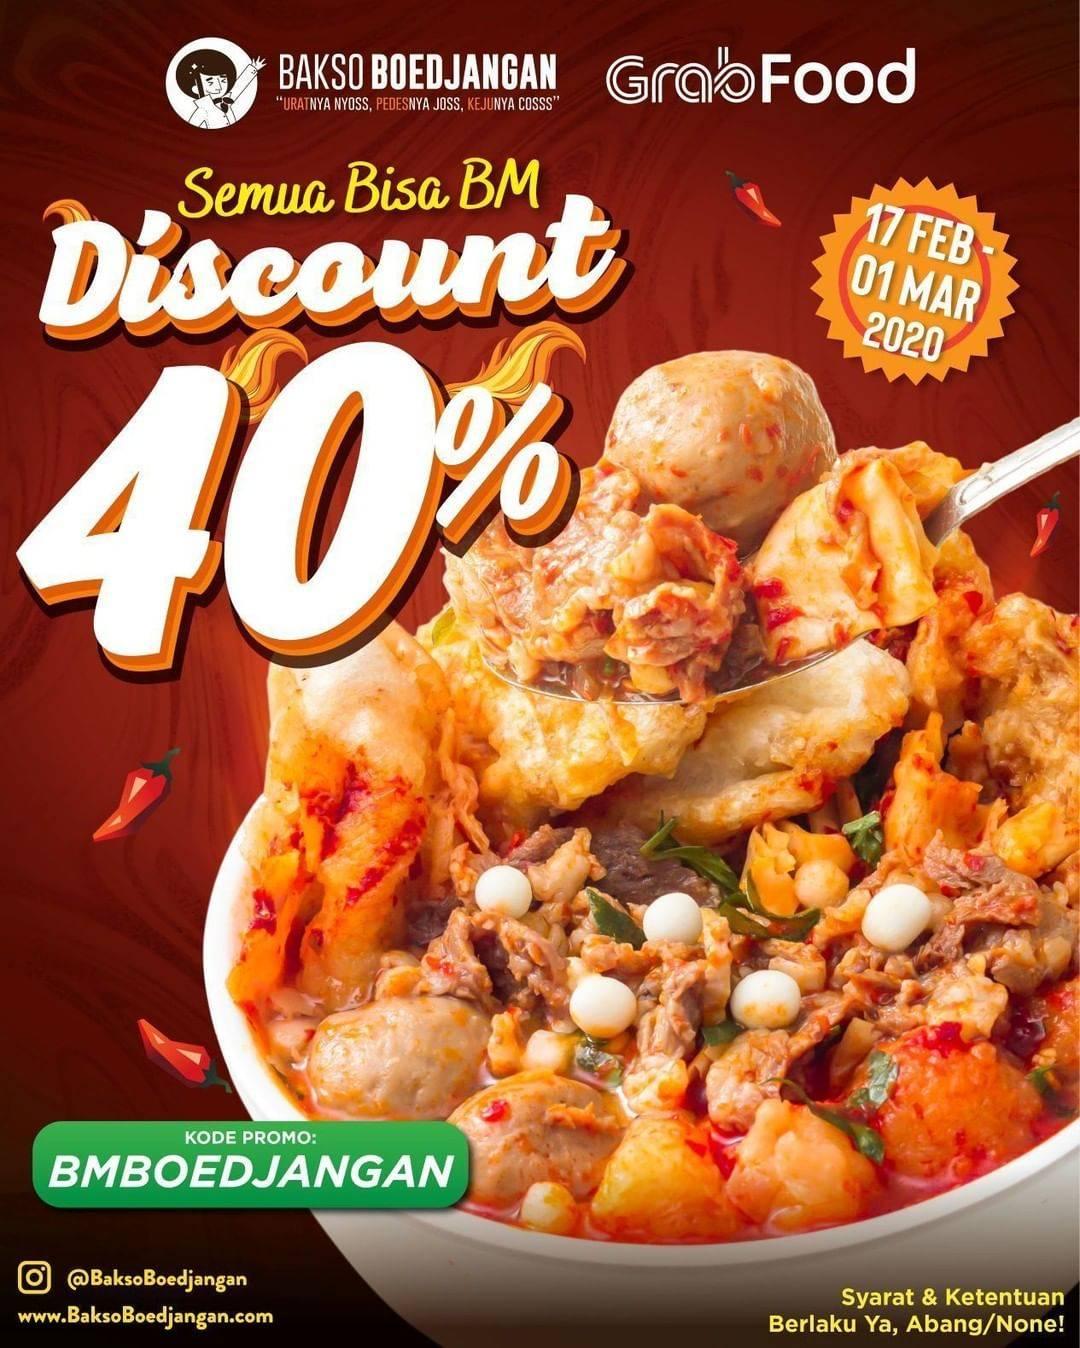 Bakso Boedjangan Promo Diskon 40% Pembelian Melalui Grabfood